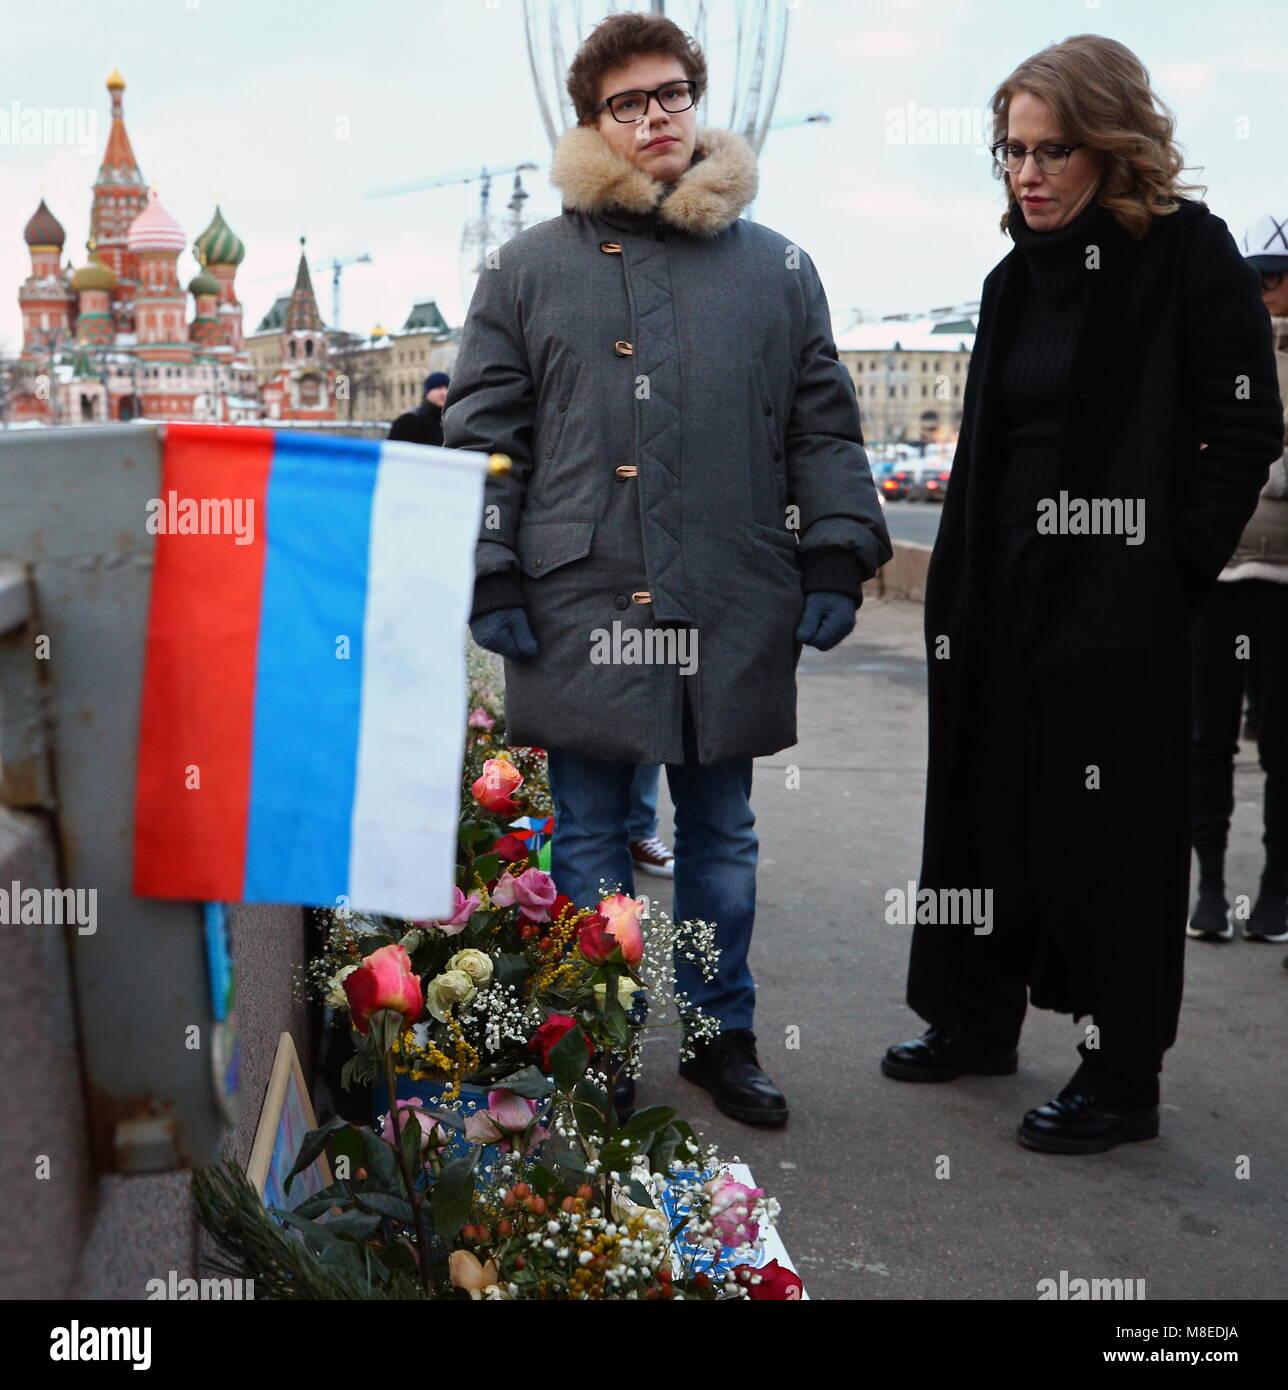 Ksenia Sobchak and Sergey Kapkov split up 05/18/2011 65